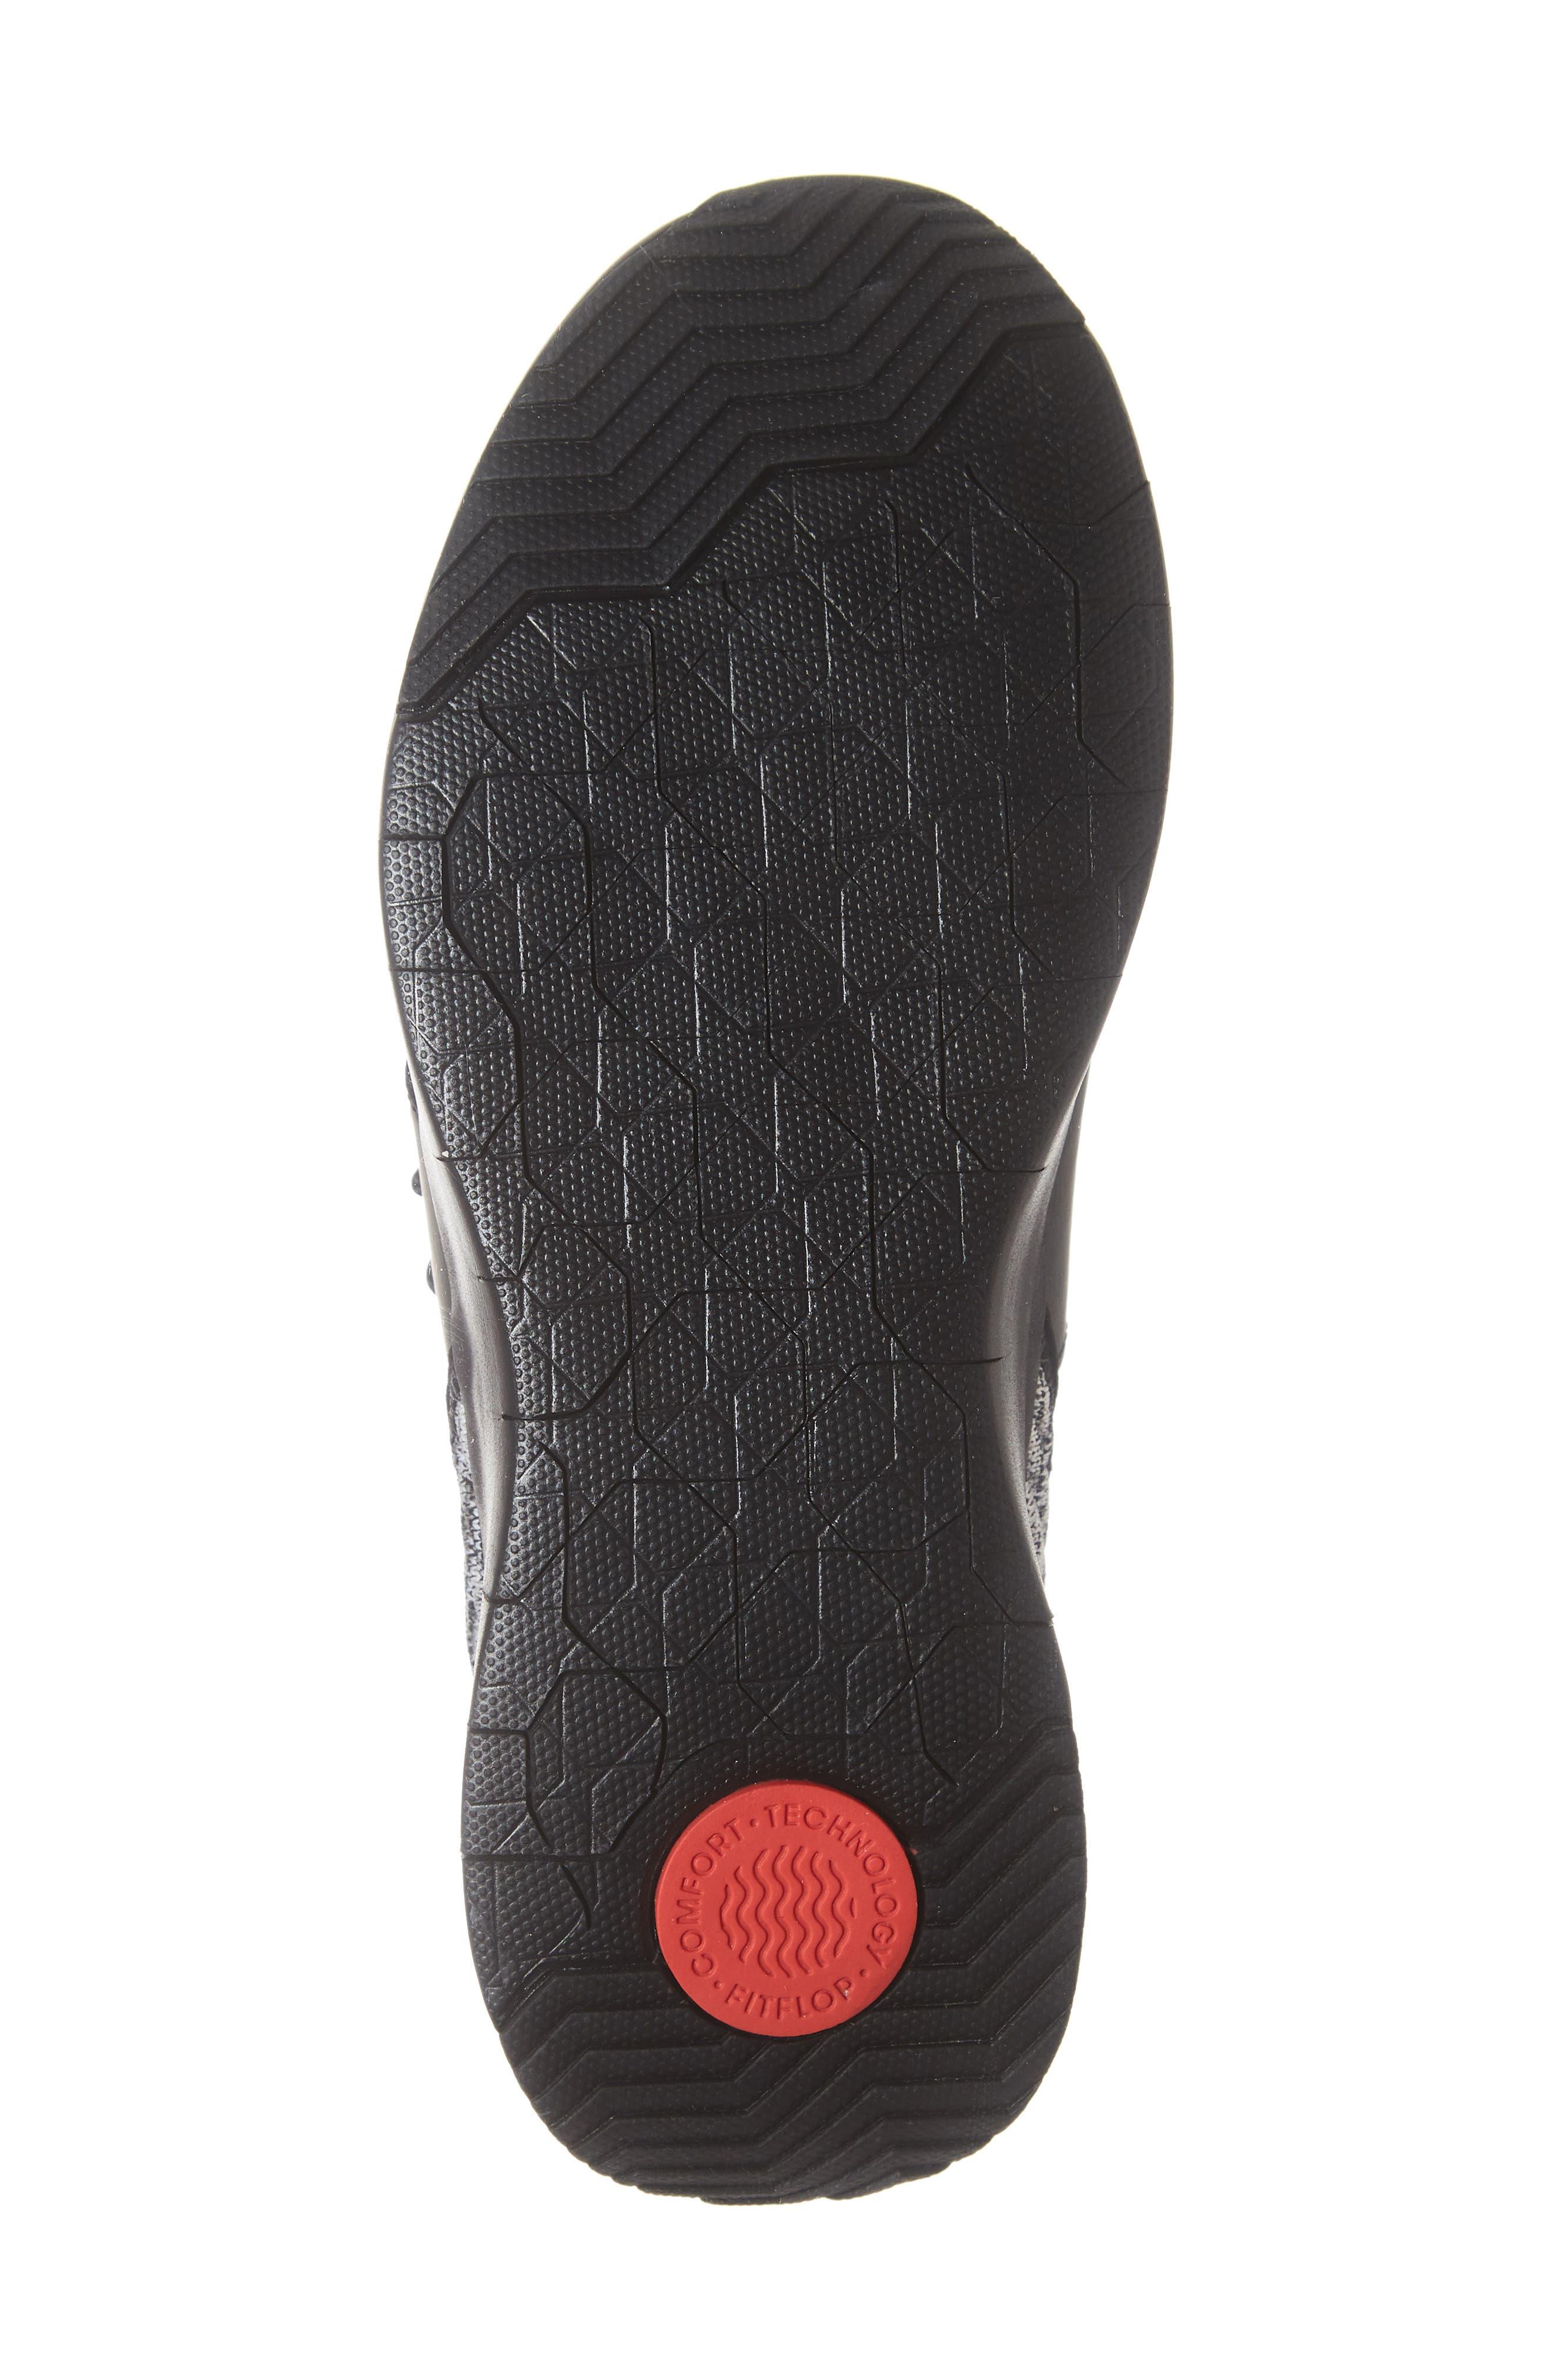 FITFLOP, Artknit Sock Sneaker, Alternate thumbnail 6, color, 017